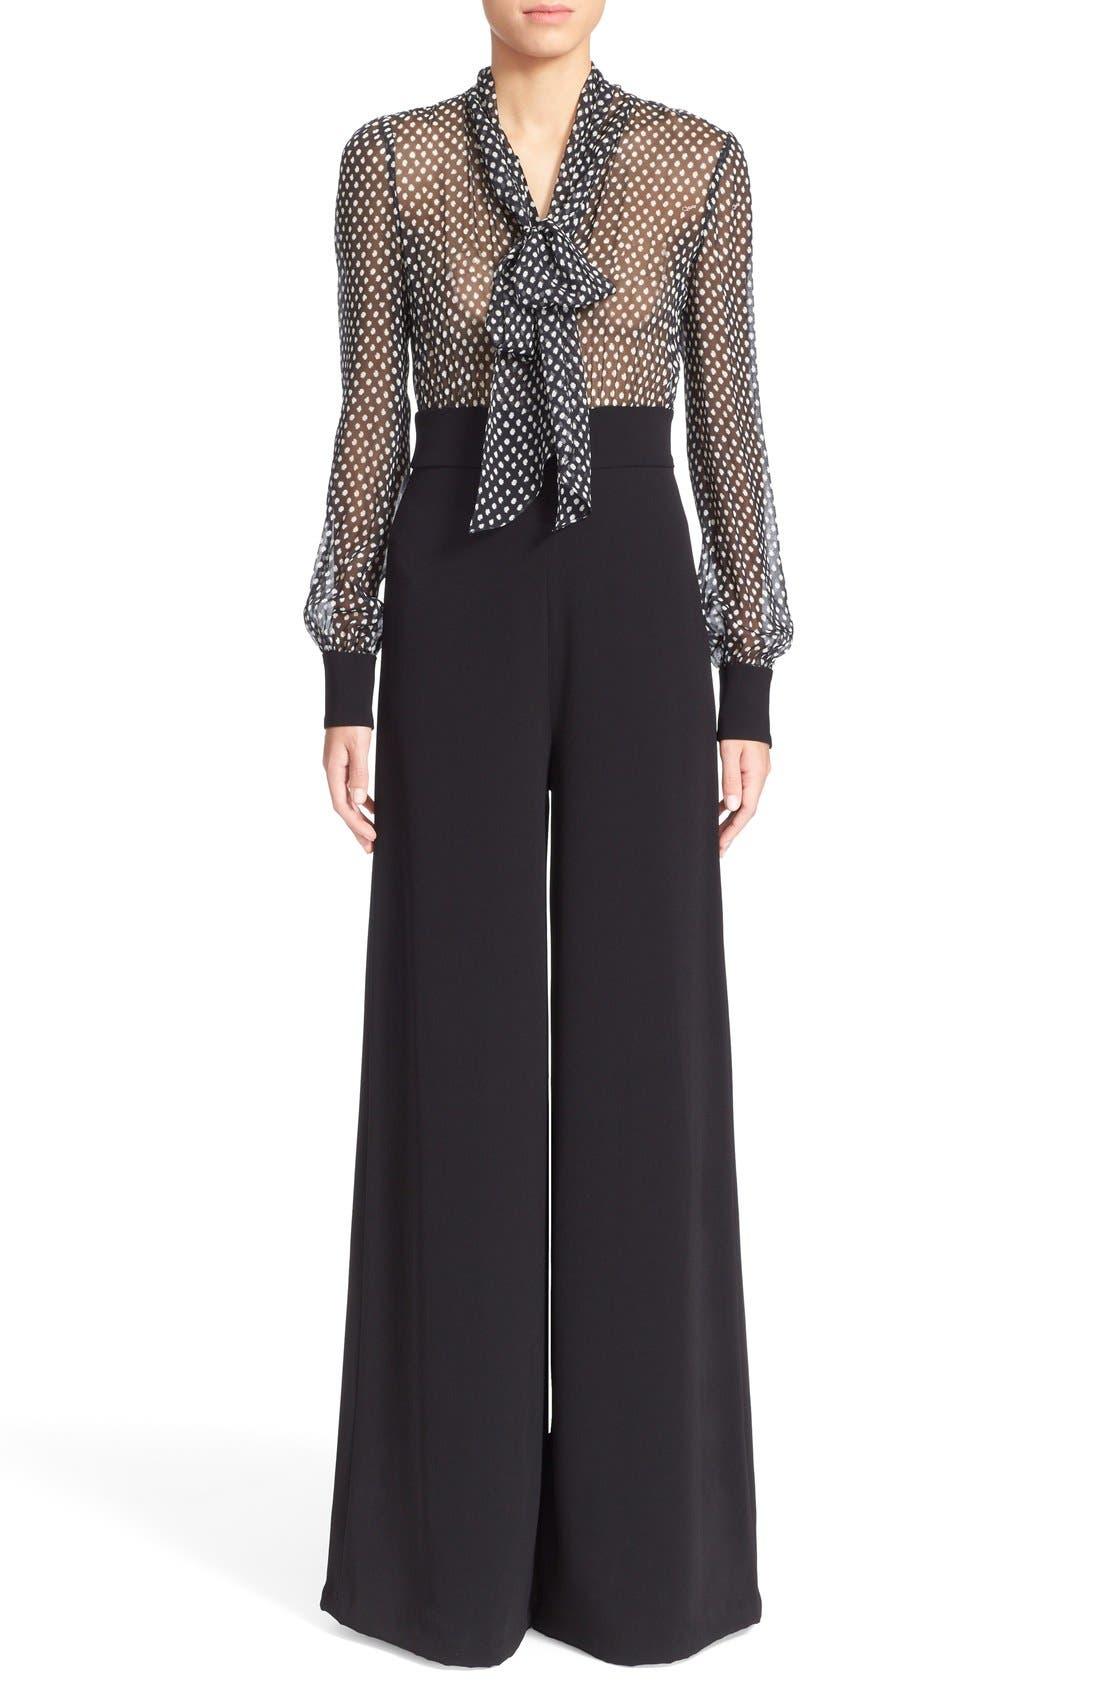 Alternate Image 1 Selected - Diane von Furstenberg 'Arabella' Polka Dot Silk Jumpsuit